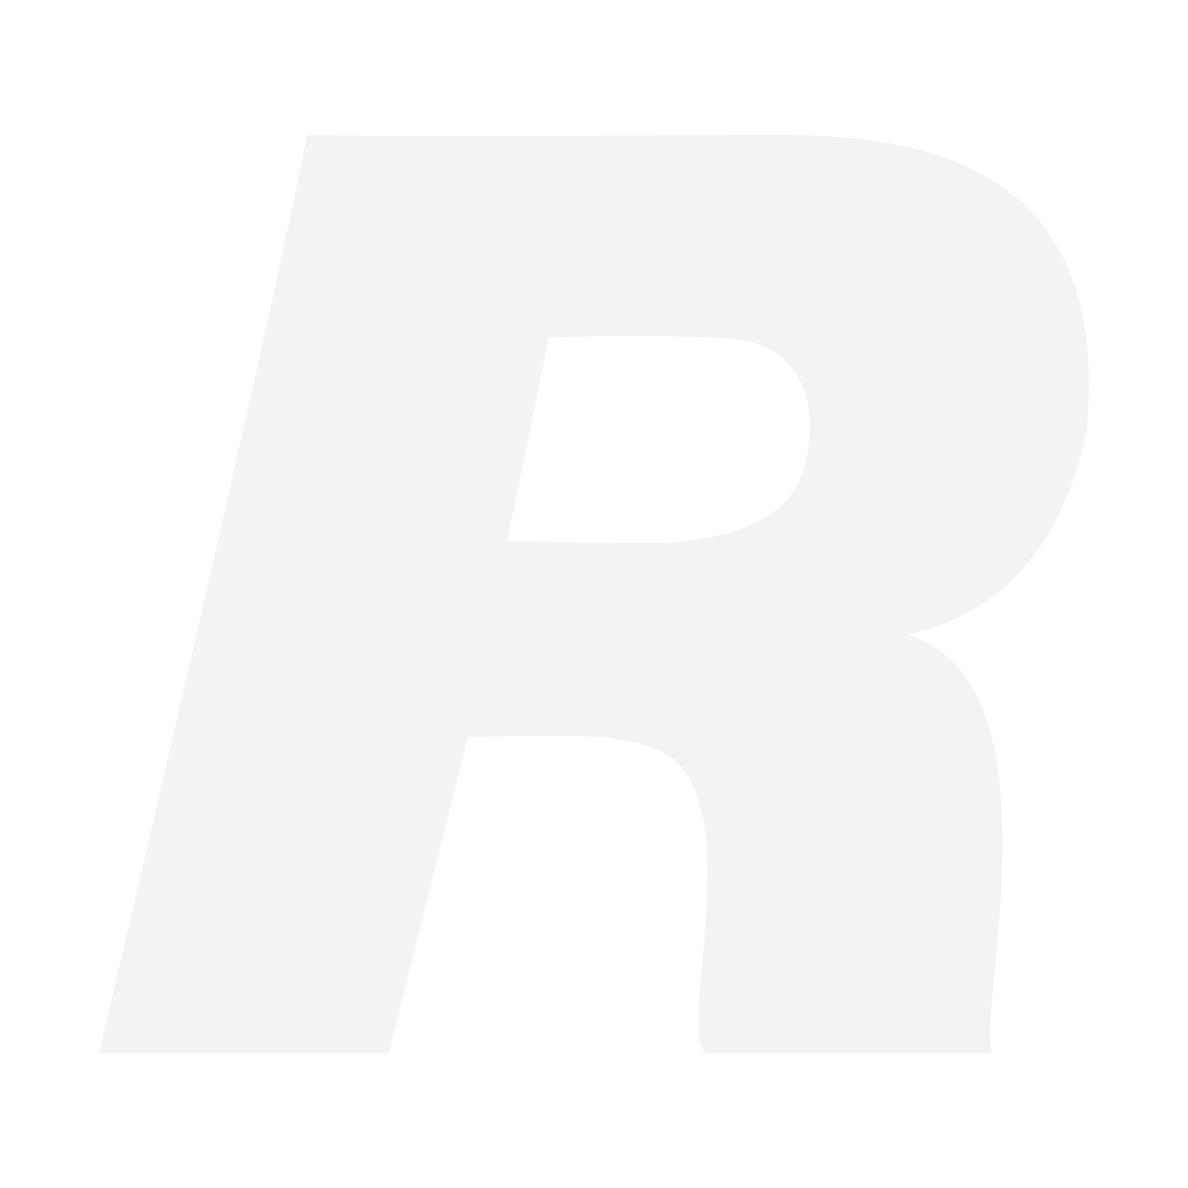 Rode Dead Cat VMP windshield  (NTG-1, NTG-2, NTG-3, VideoMic Pro)